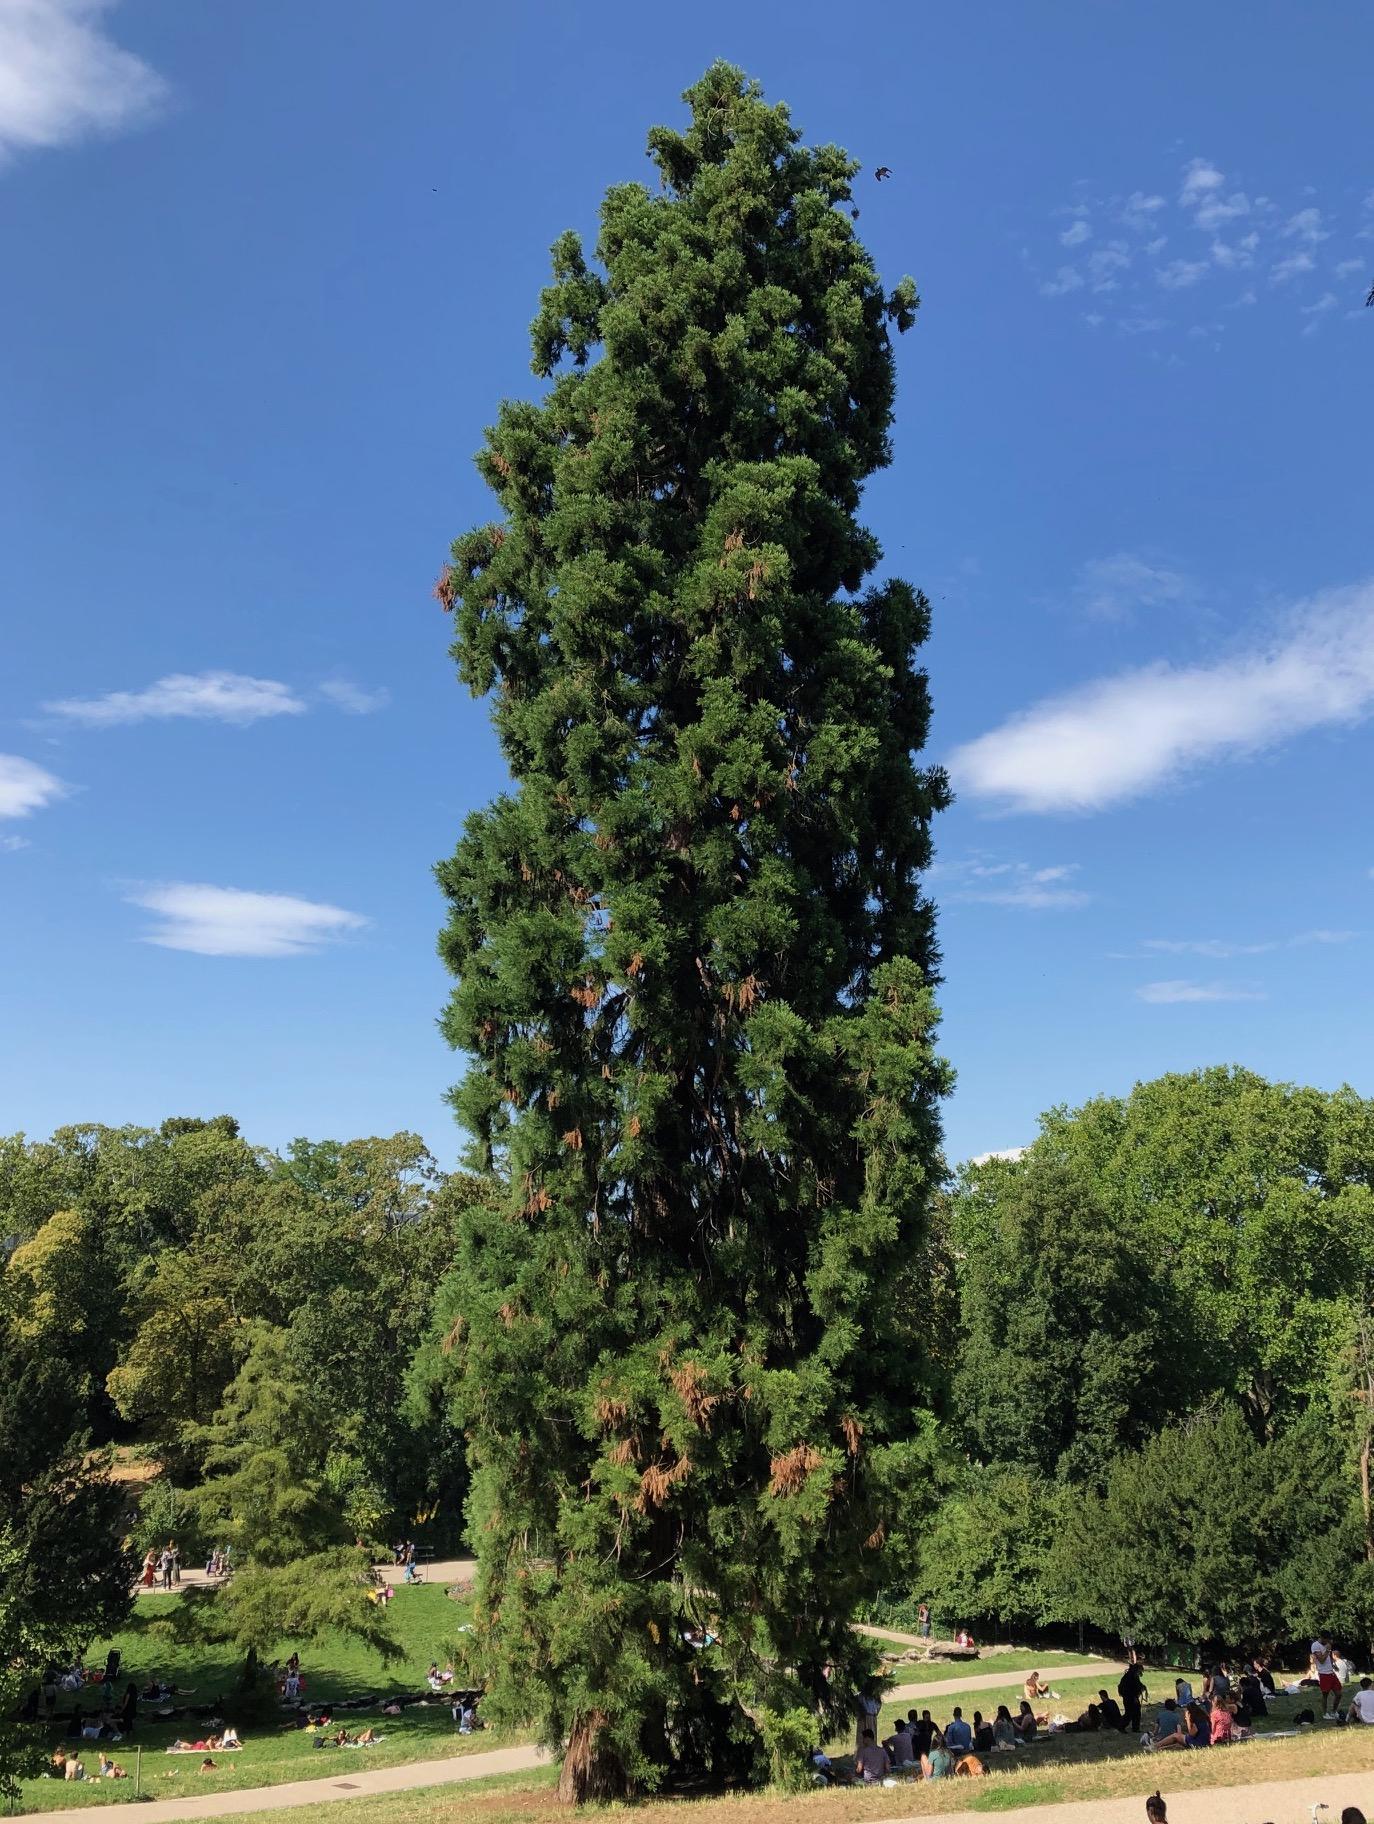 sequoia geant buttes chaumont